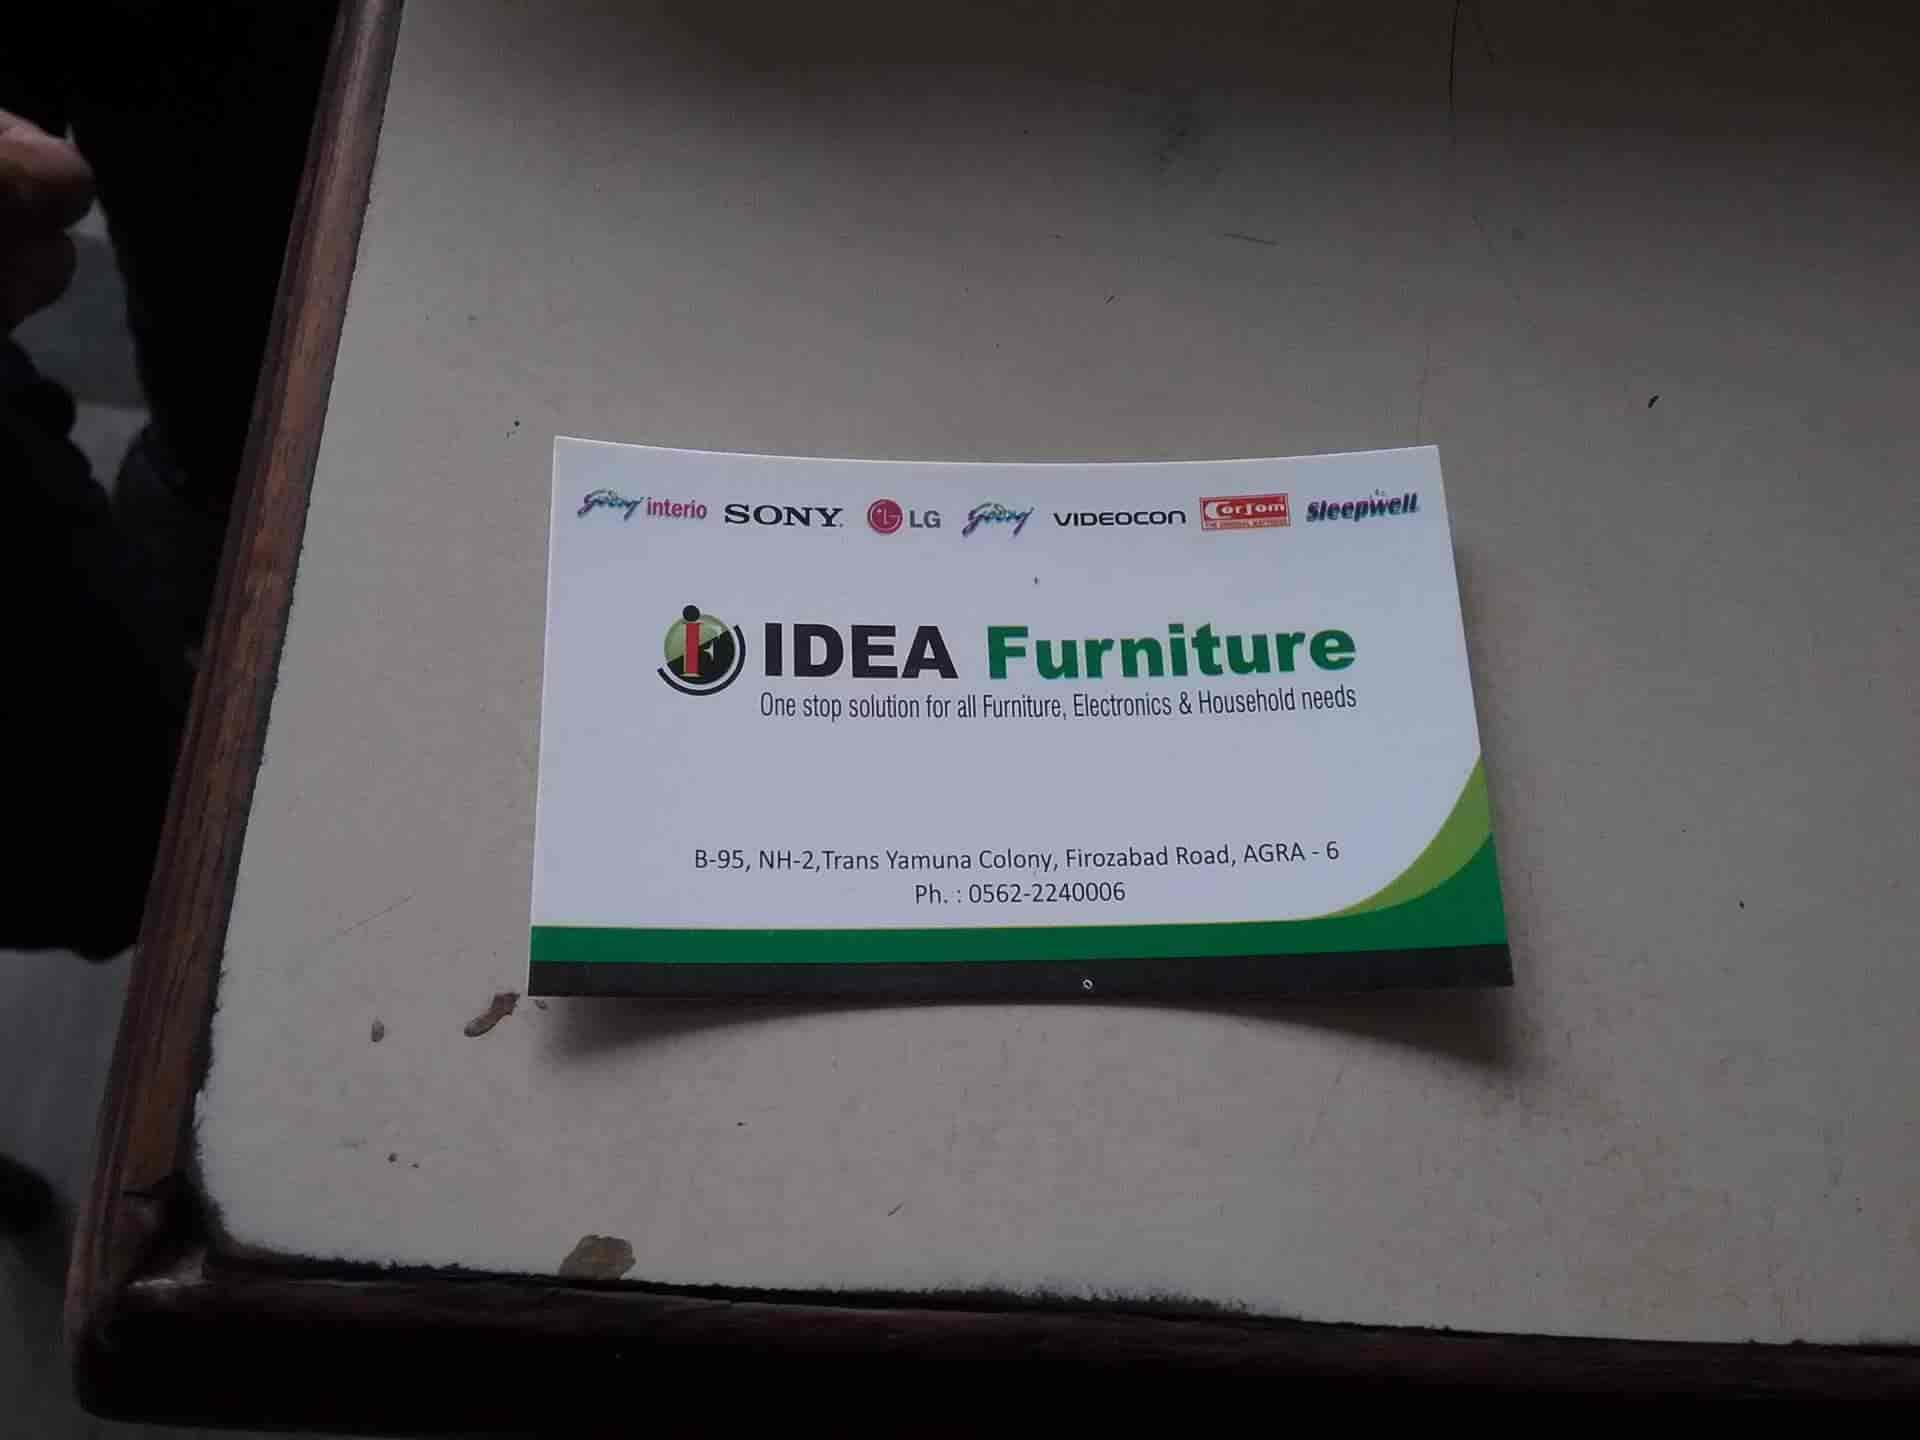 ... Idea Furniture Photos, Trans Yamuna Colony, AGRA   Furniture Dealers ...